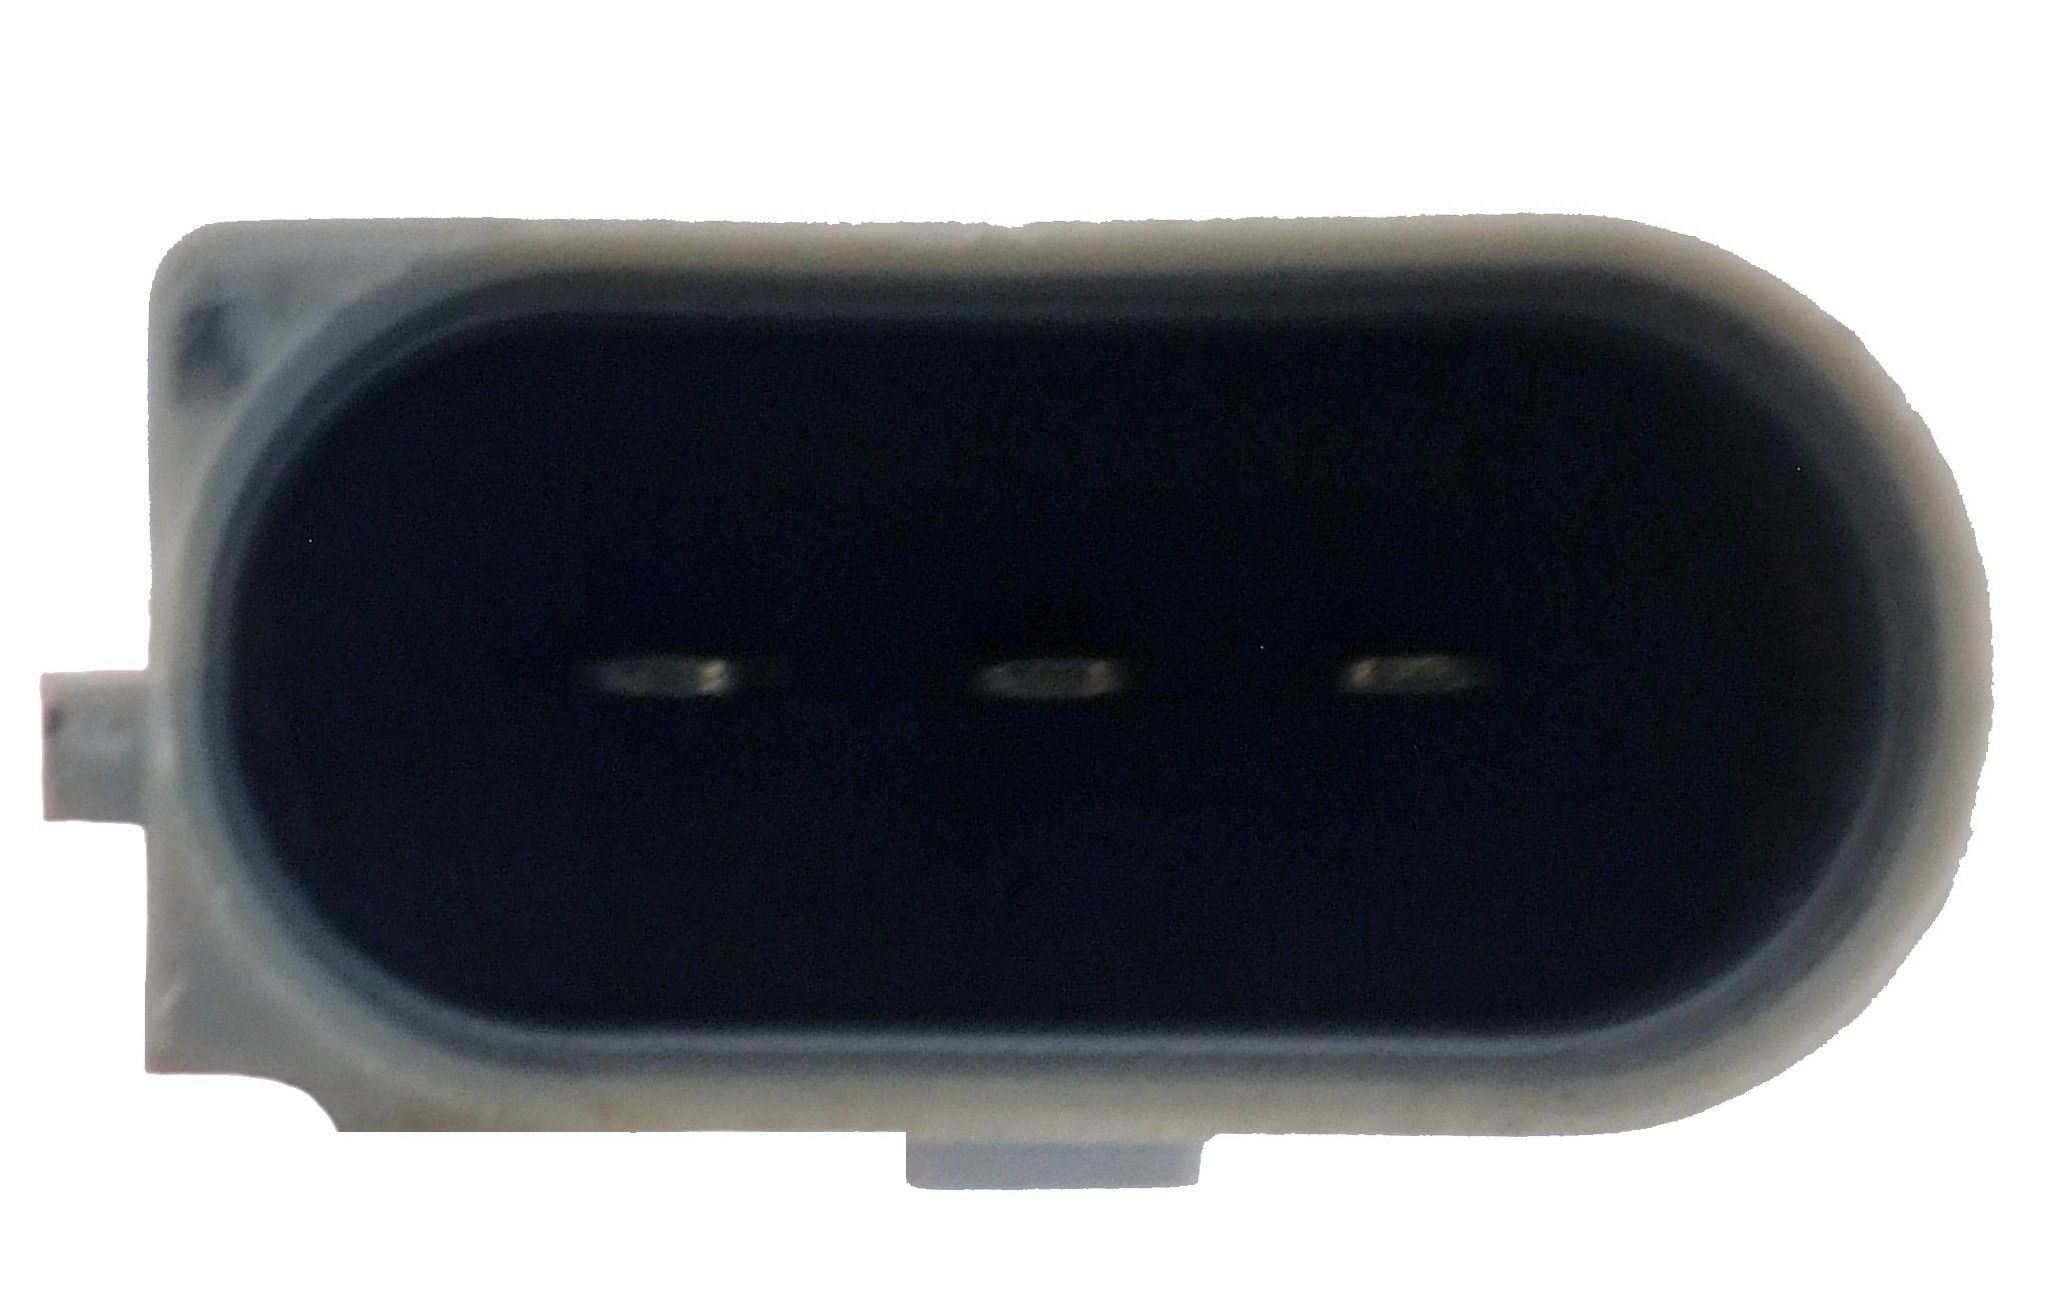 Audi S4 Engine Crankshaft Position Sensor Replacement (Beck